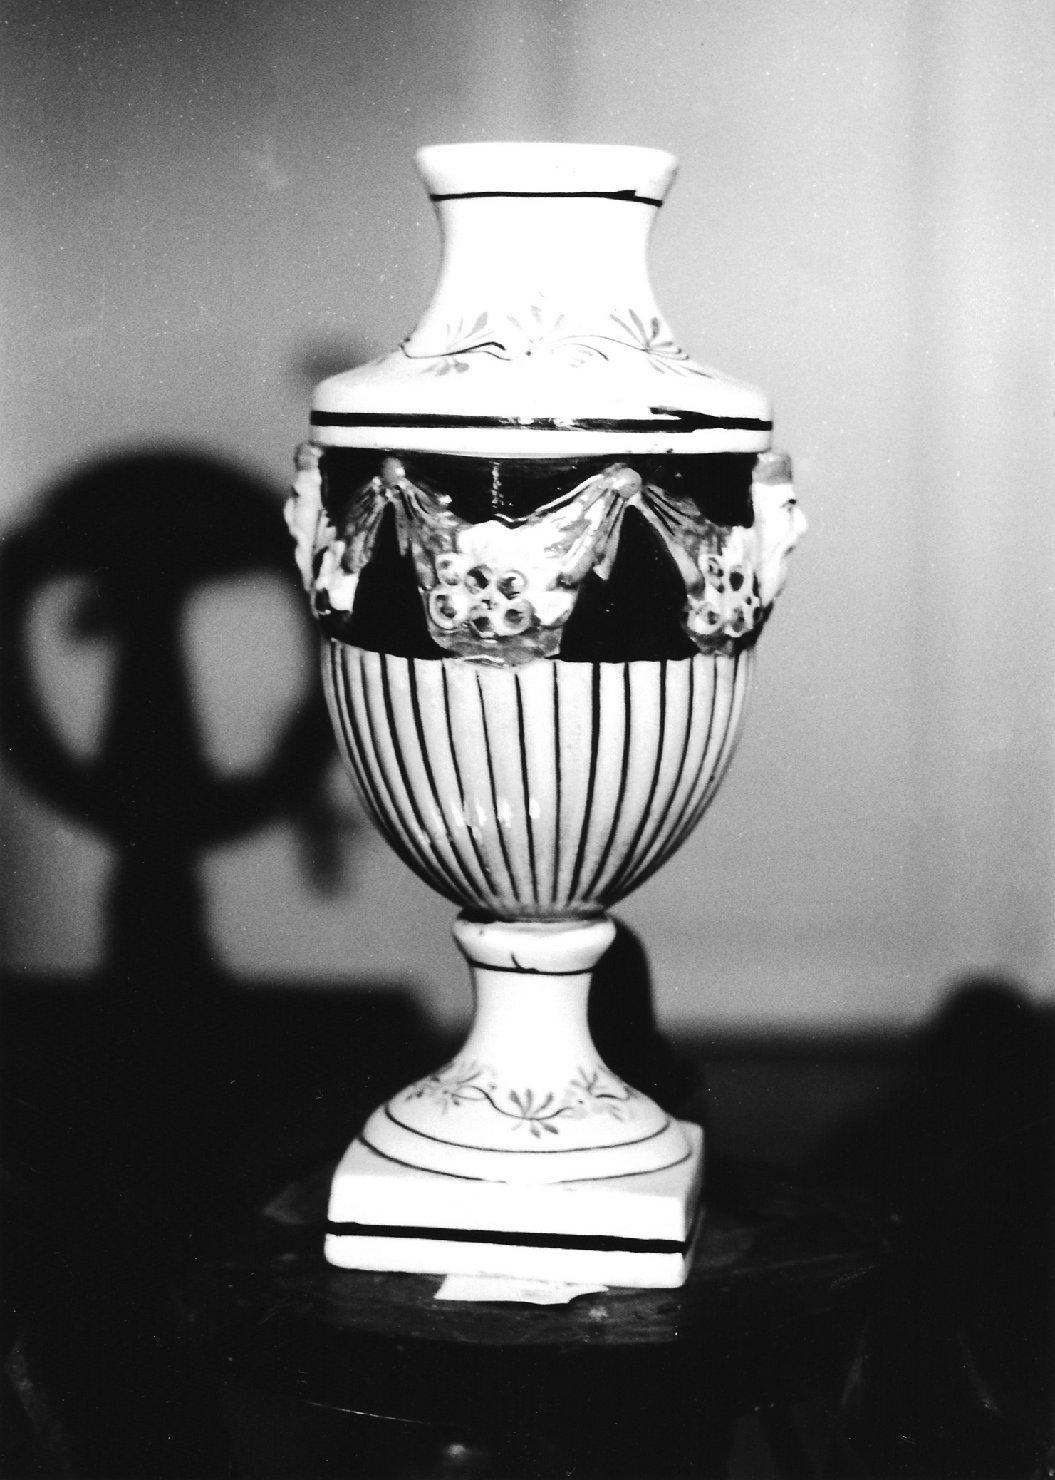 vaso, opera isolata - ambito italiano (secc. XVIII/ XIX)